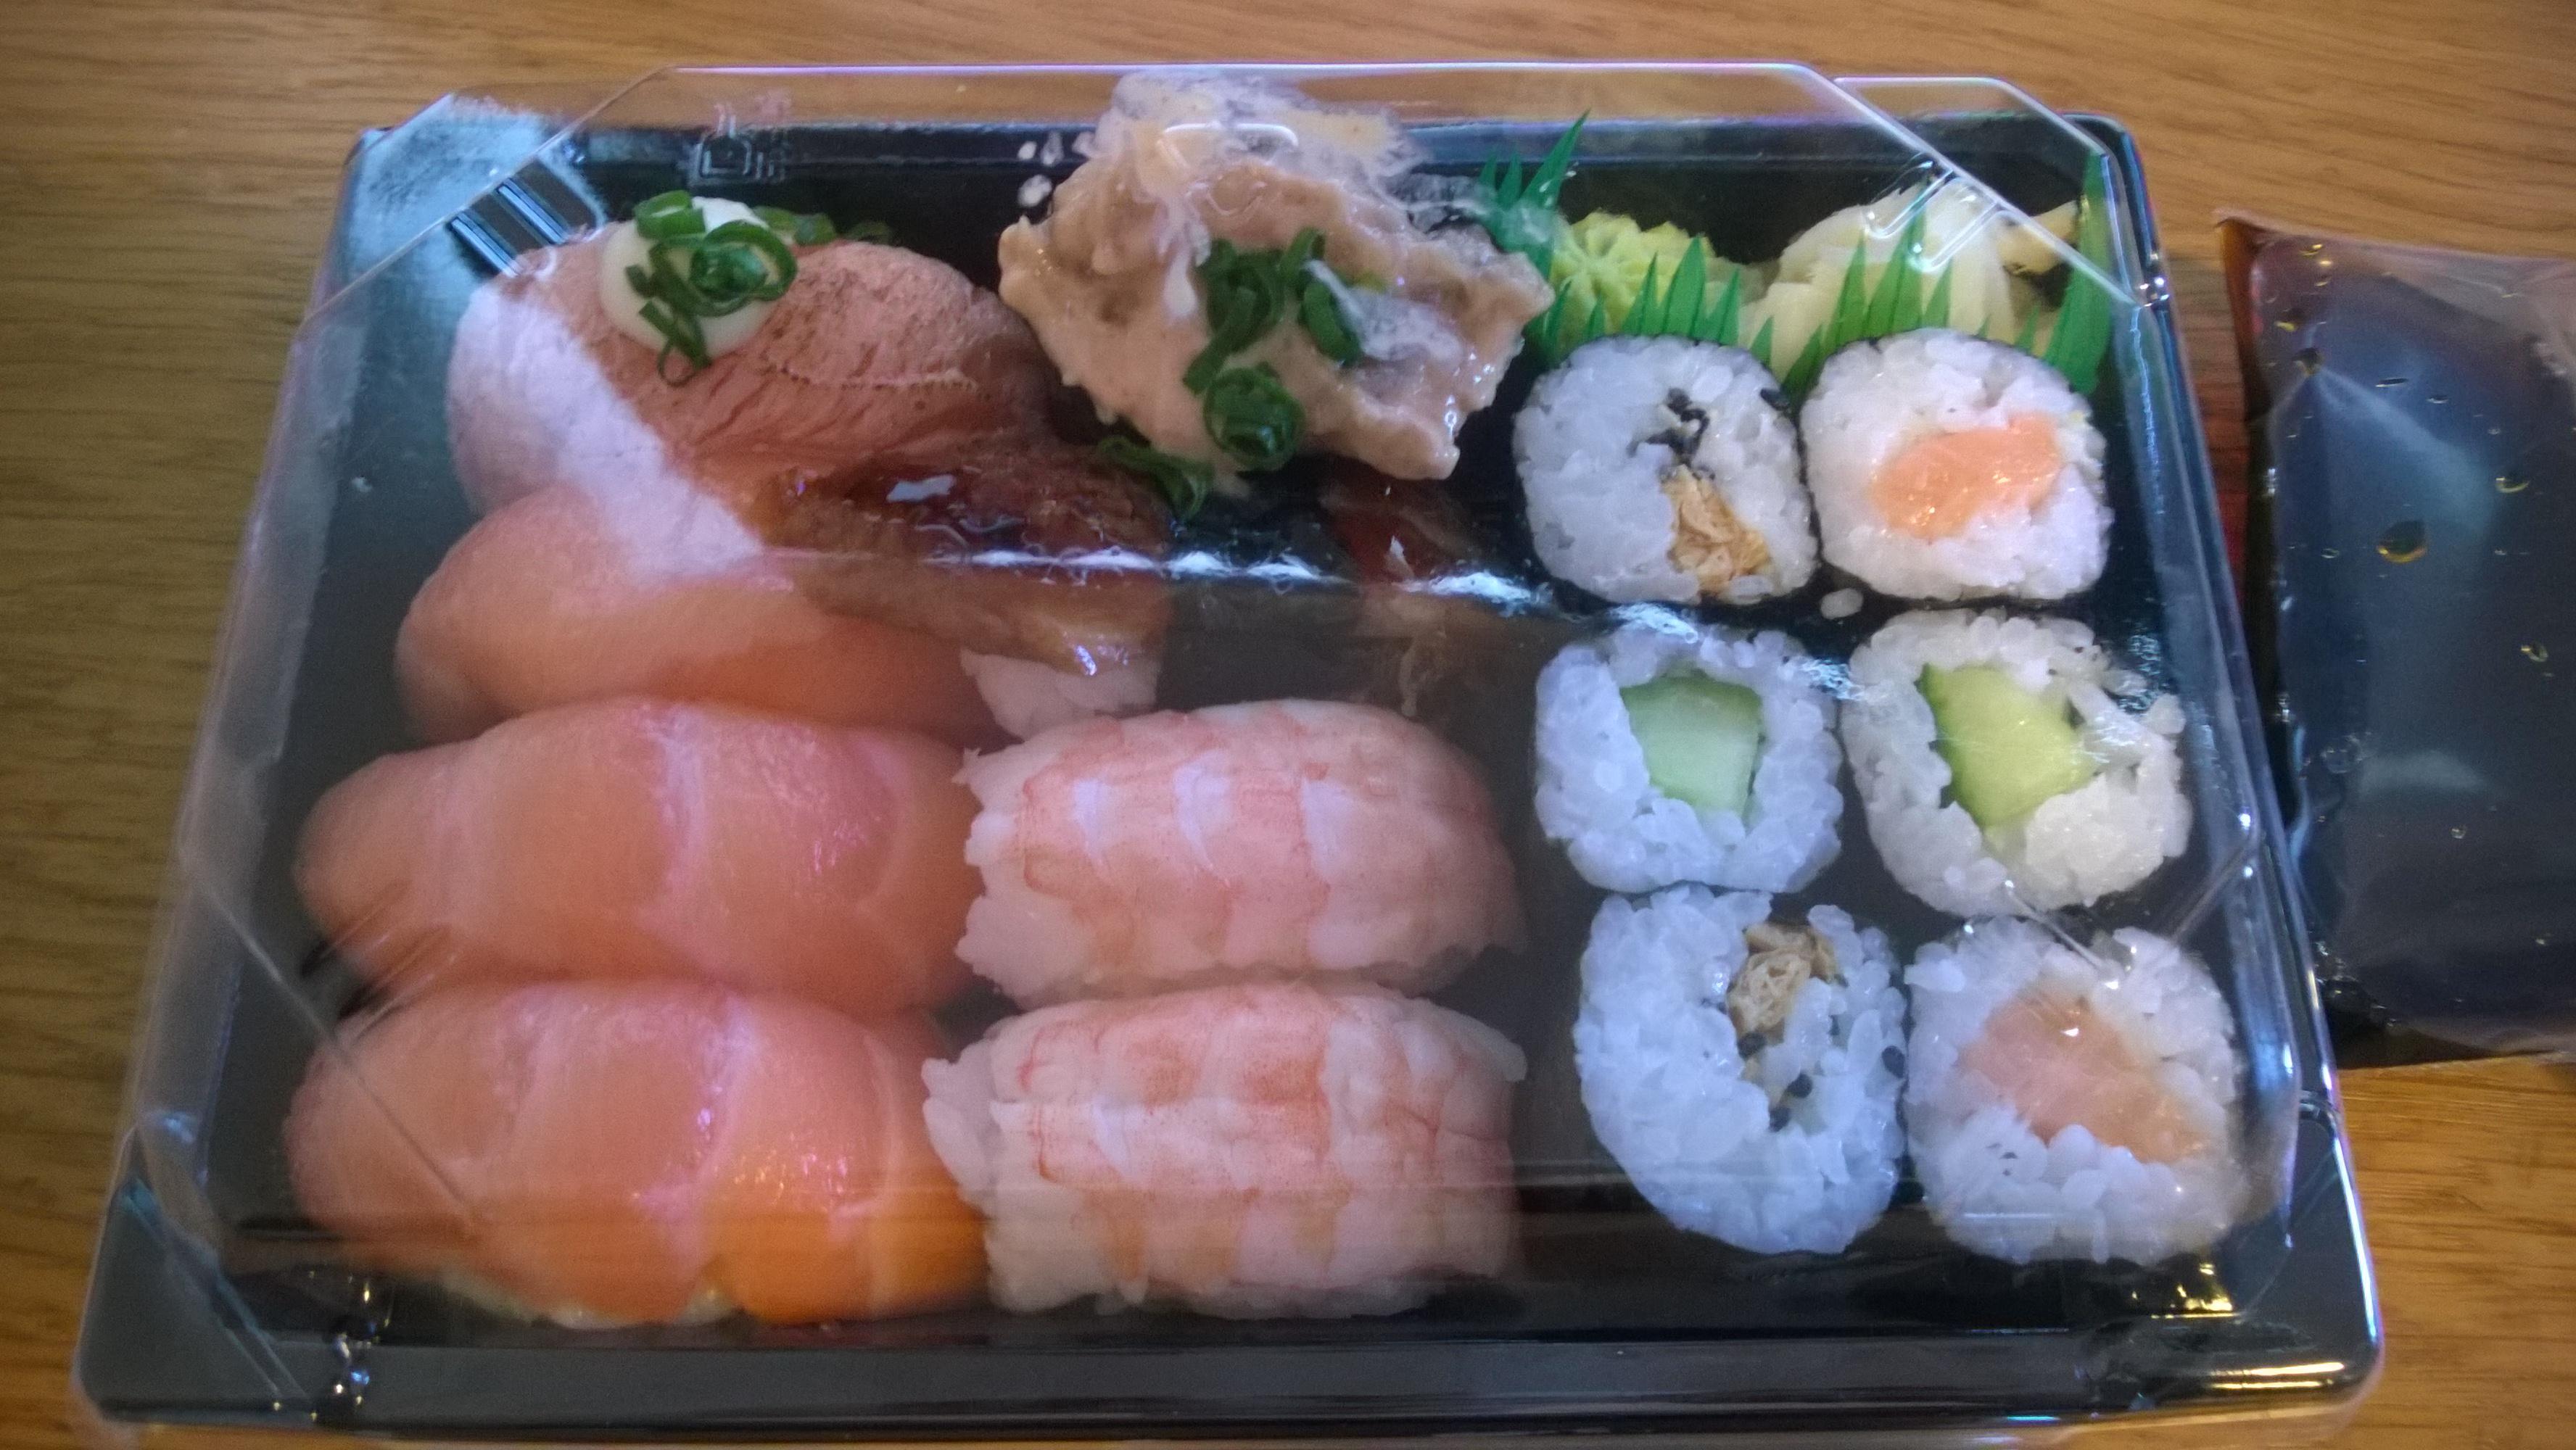 LN-Sushi Art, Espoo: Meal 3